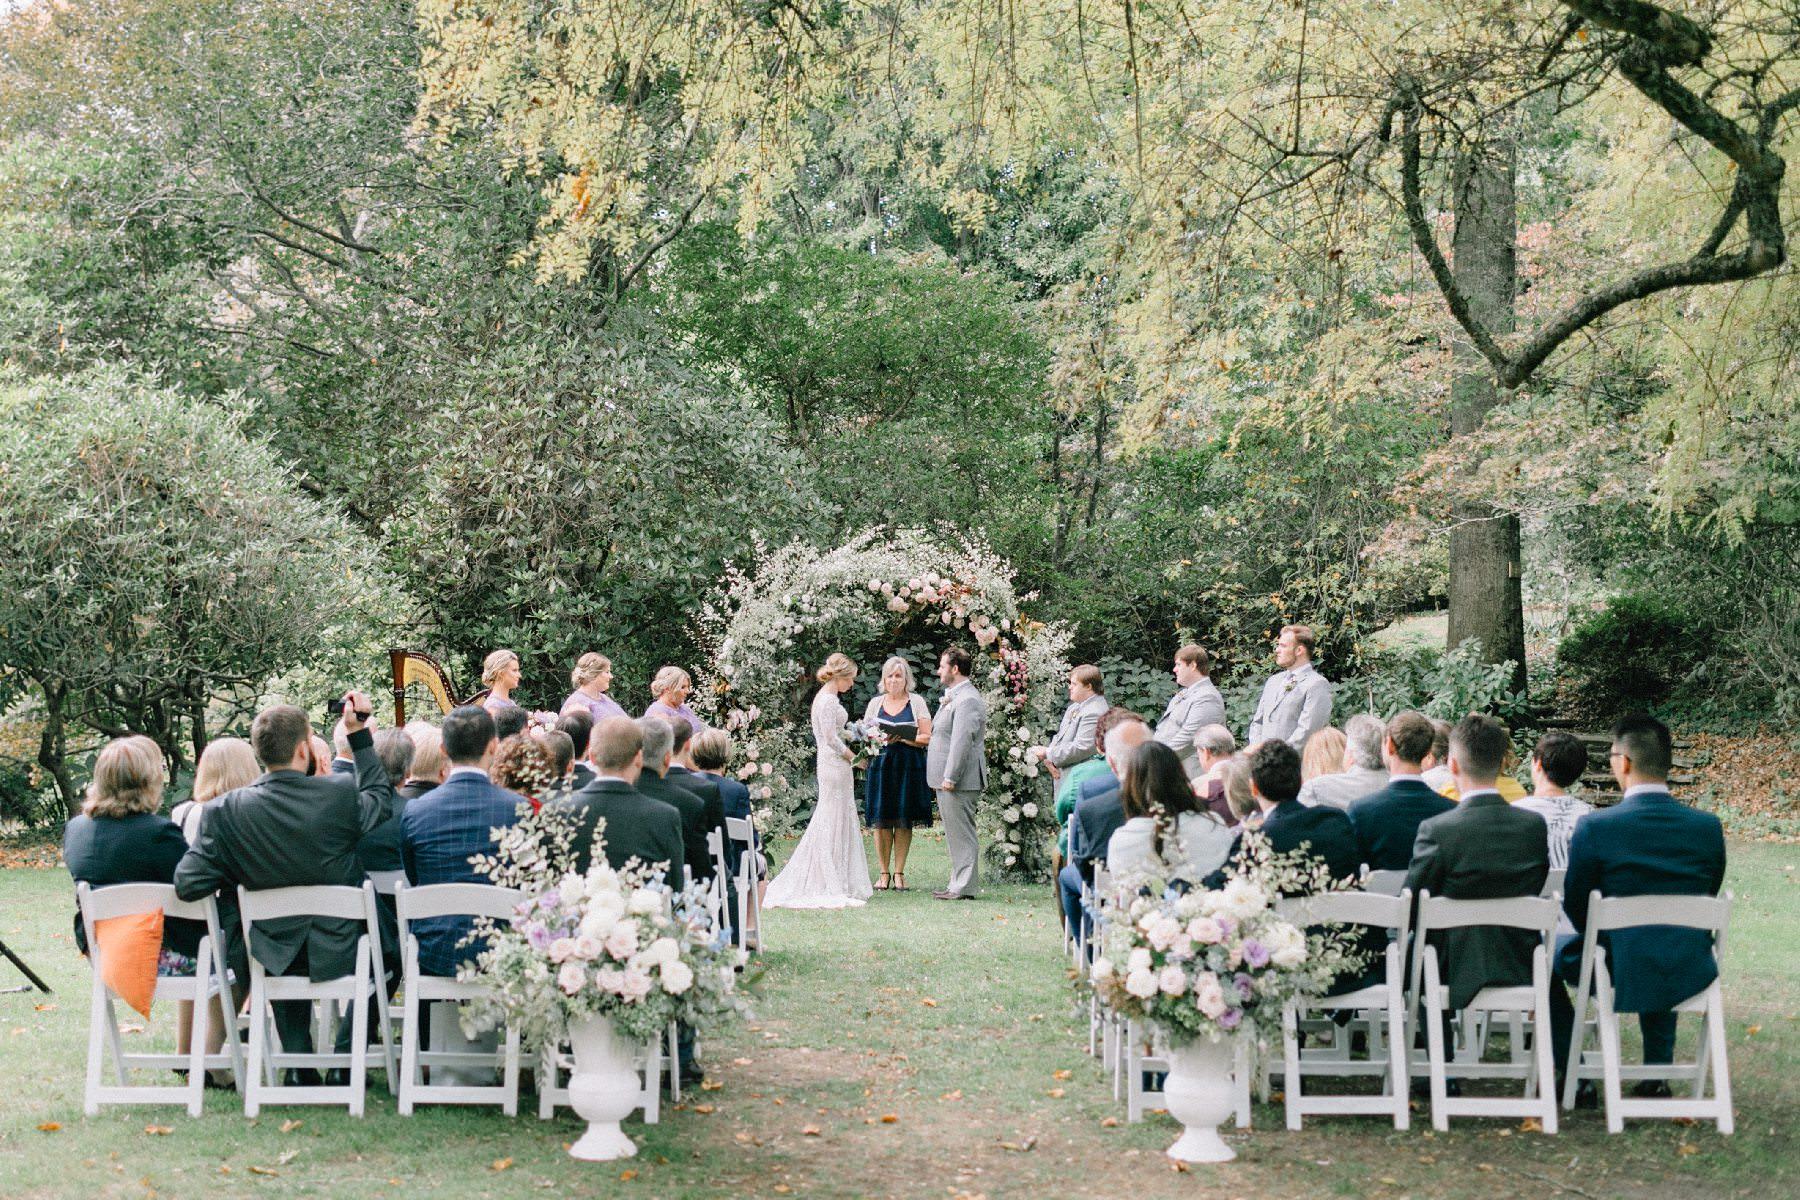 milton park wedding photo by nattnee